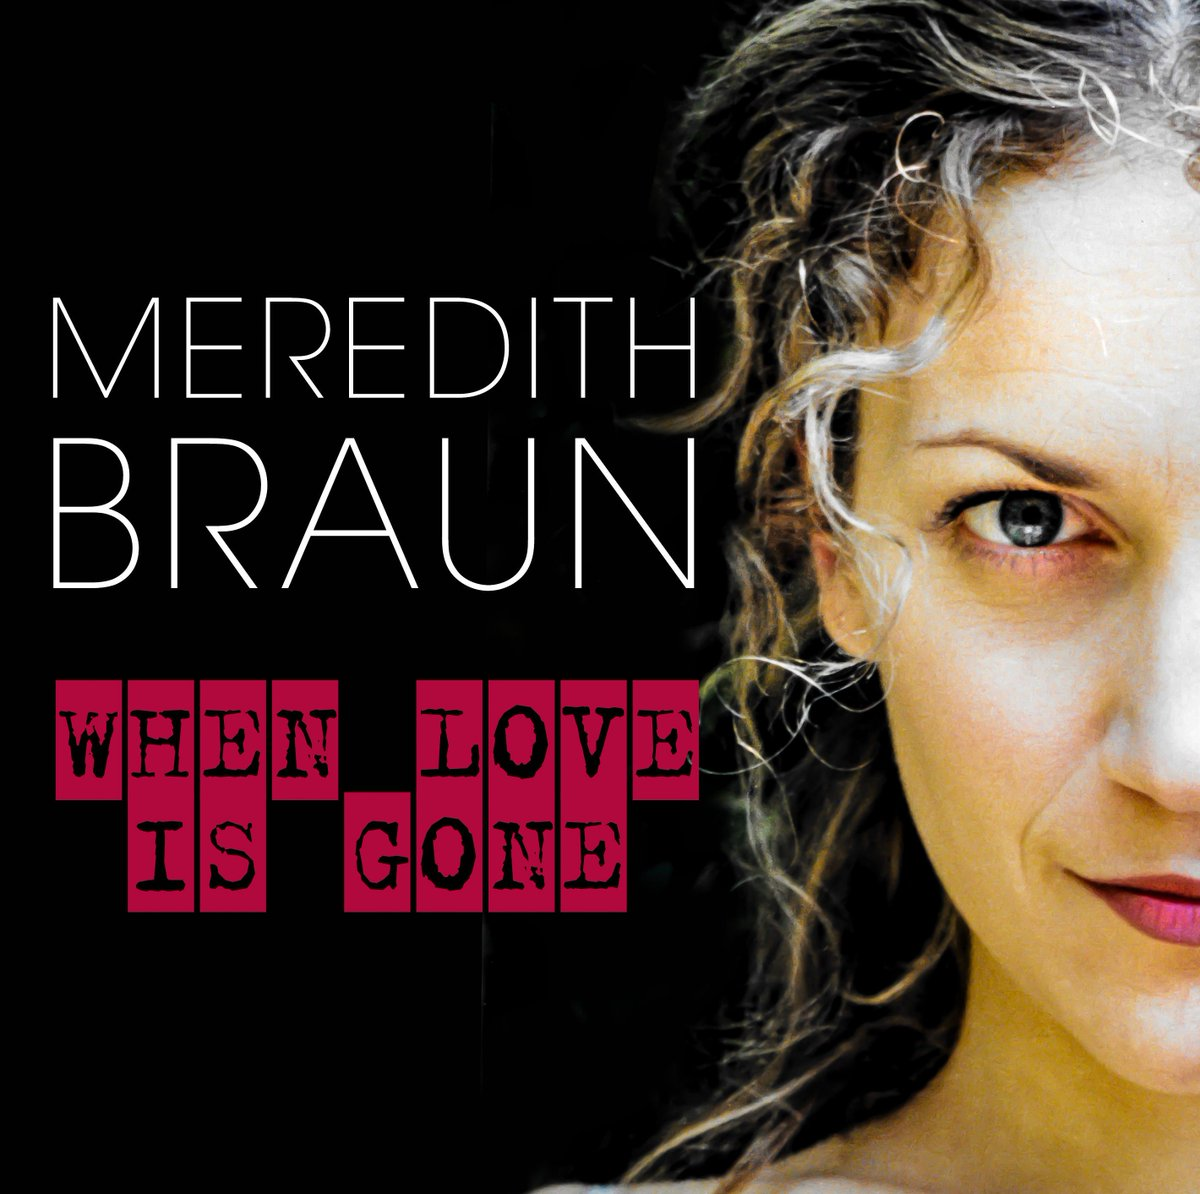 Meredith Braun original soundtrack